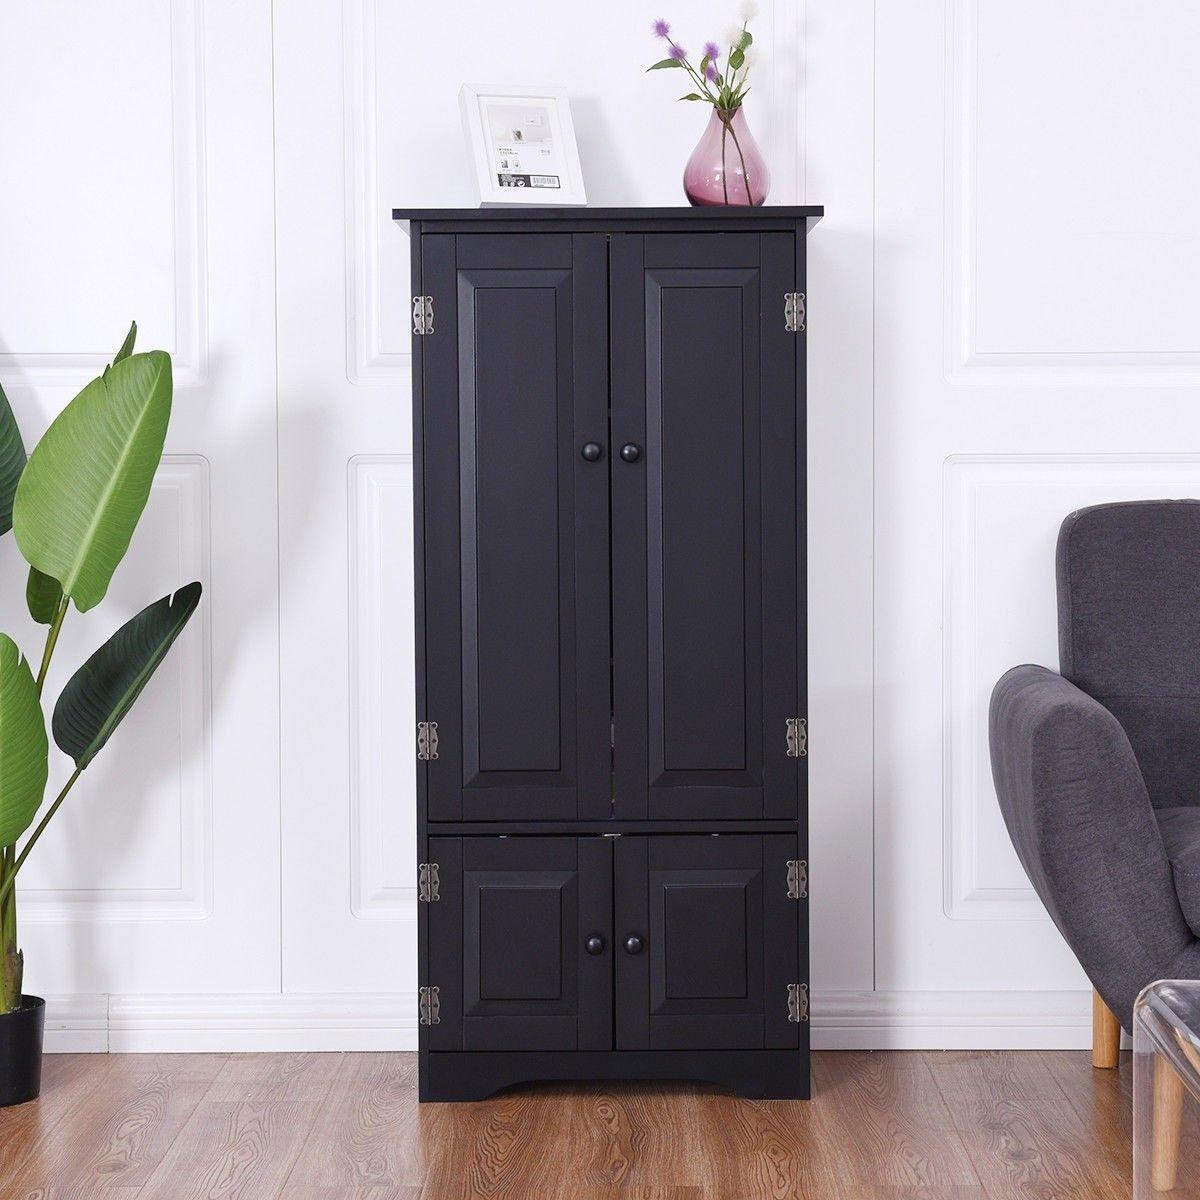 Accent Storage Cabinet W Adjustable Shelves Accent Storage Cabinet Adjustable Shelving Shelf Furniture